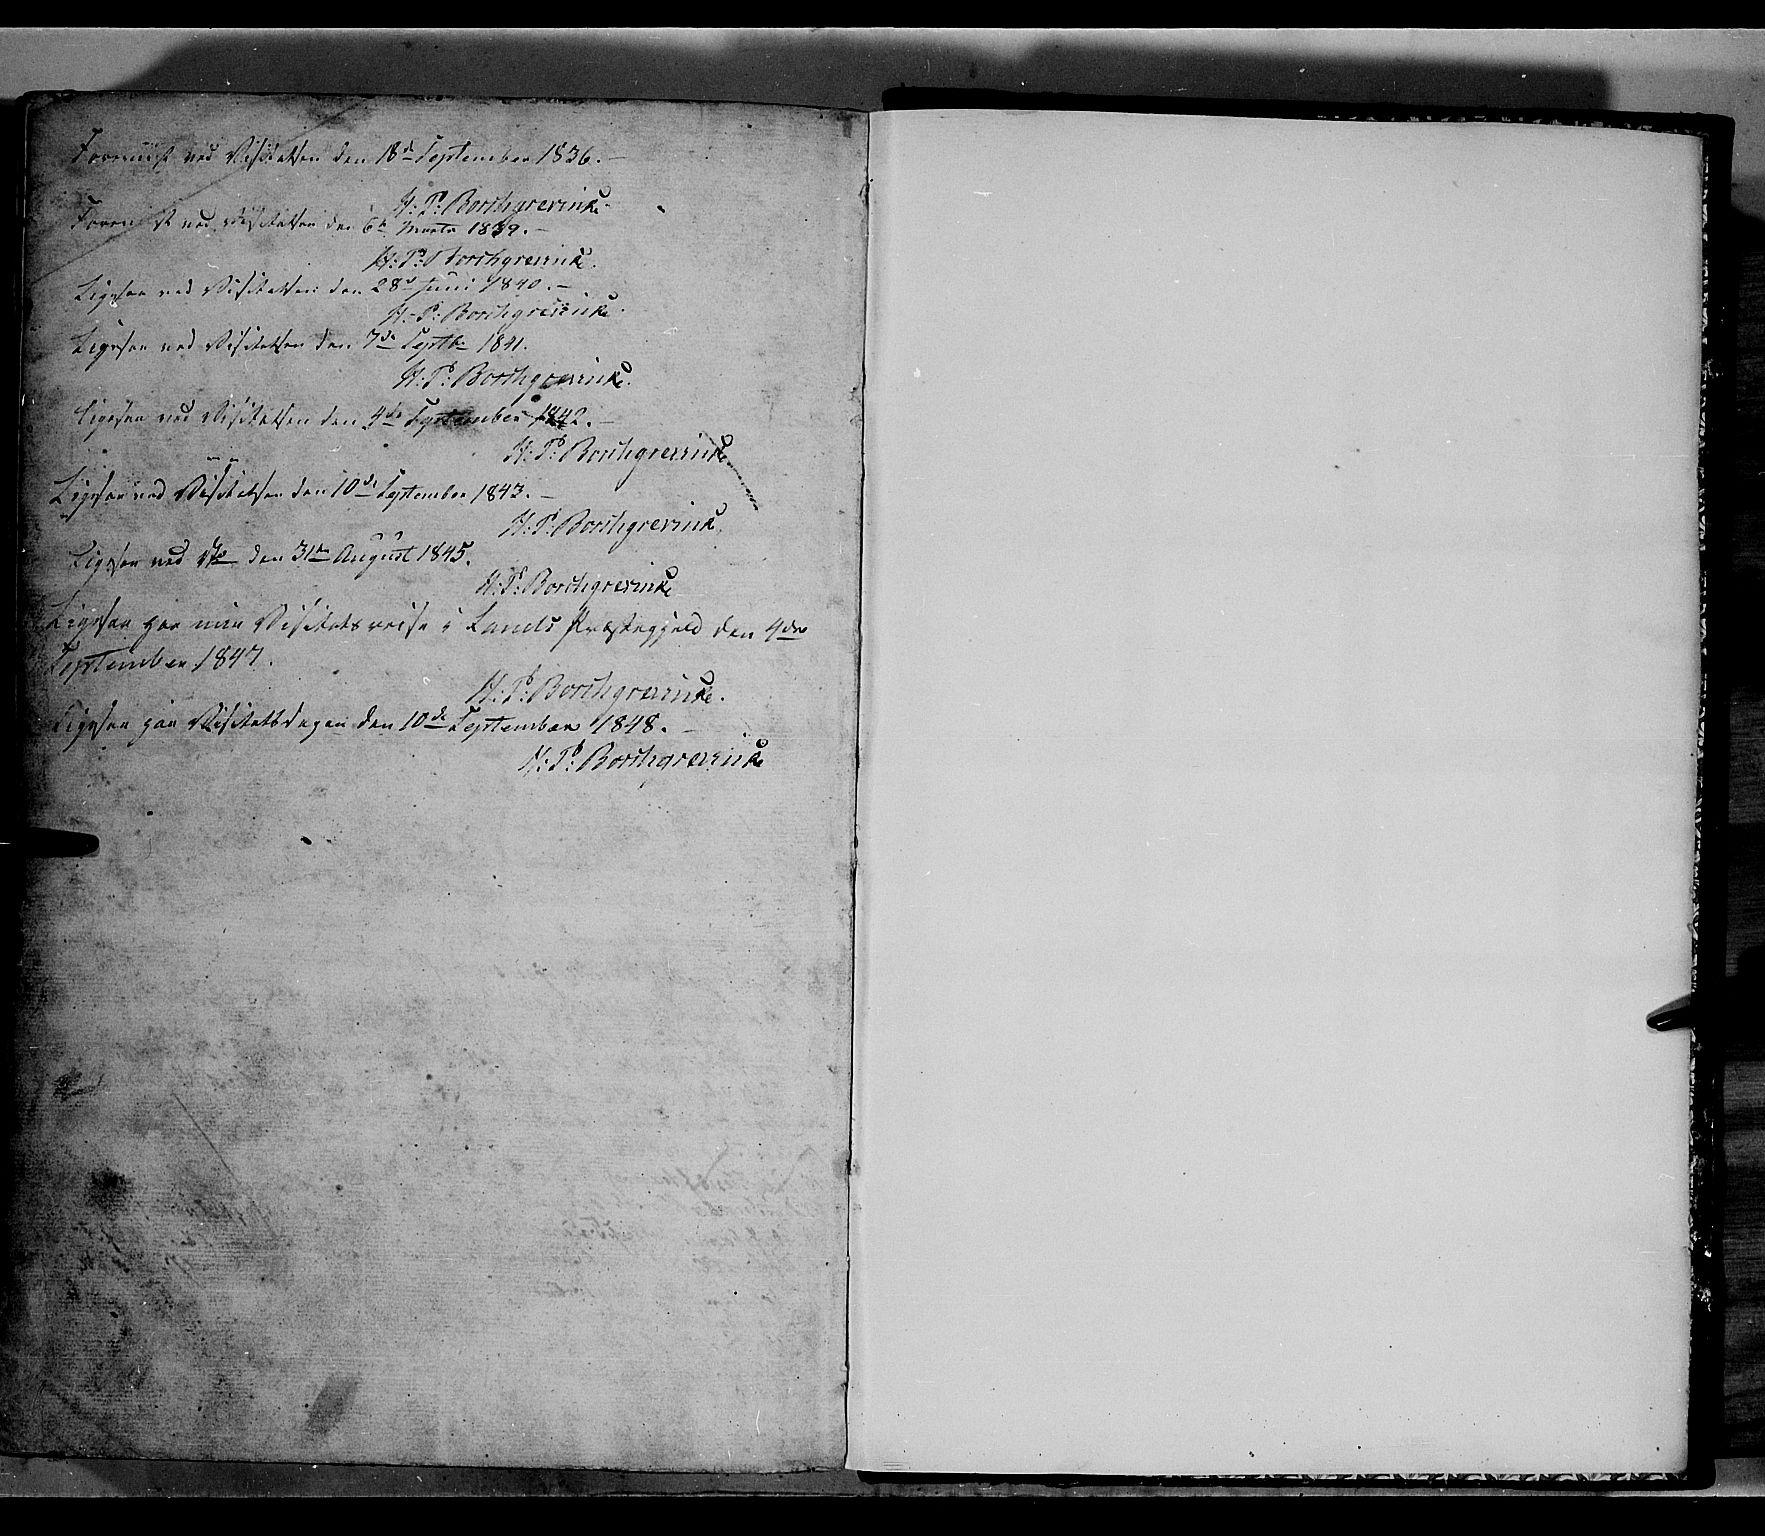 SAH, Land prestekontor, Klokkerbok nr. 2, 1833-1849, s. 278